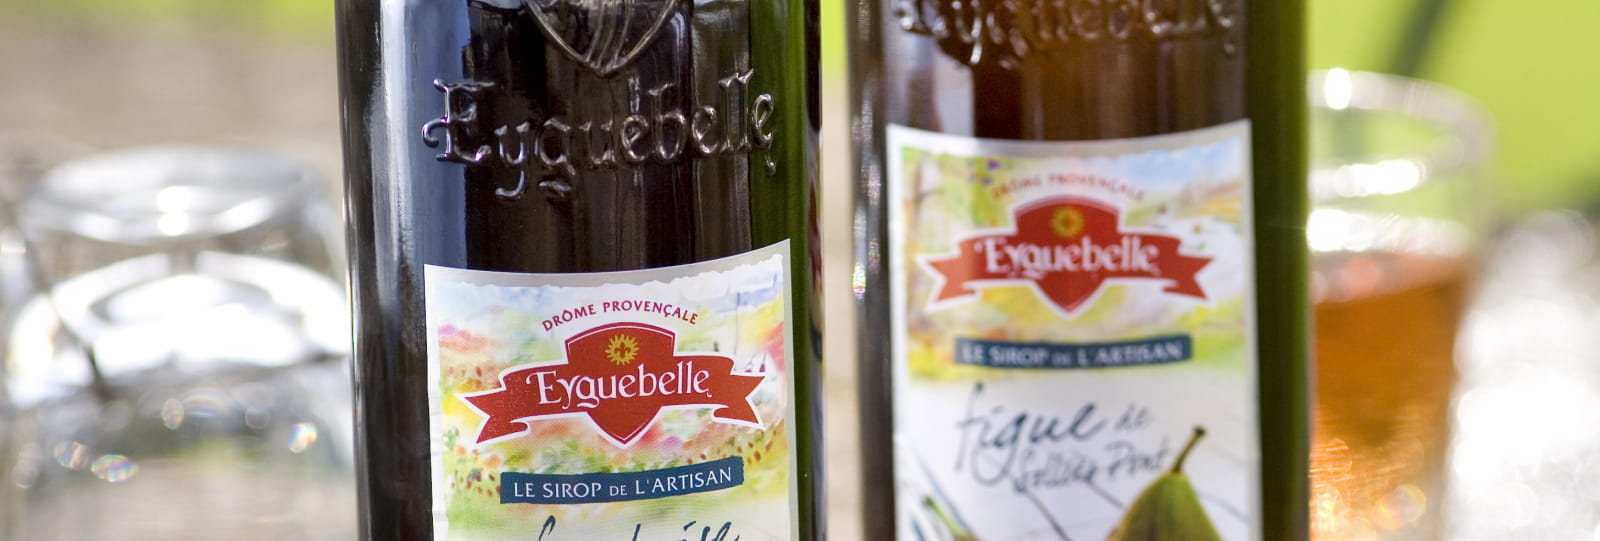 Domaine Eyguebelle dégustation et  vente